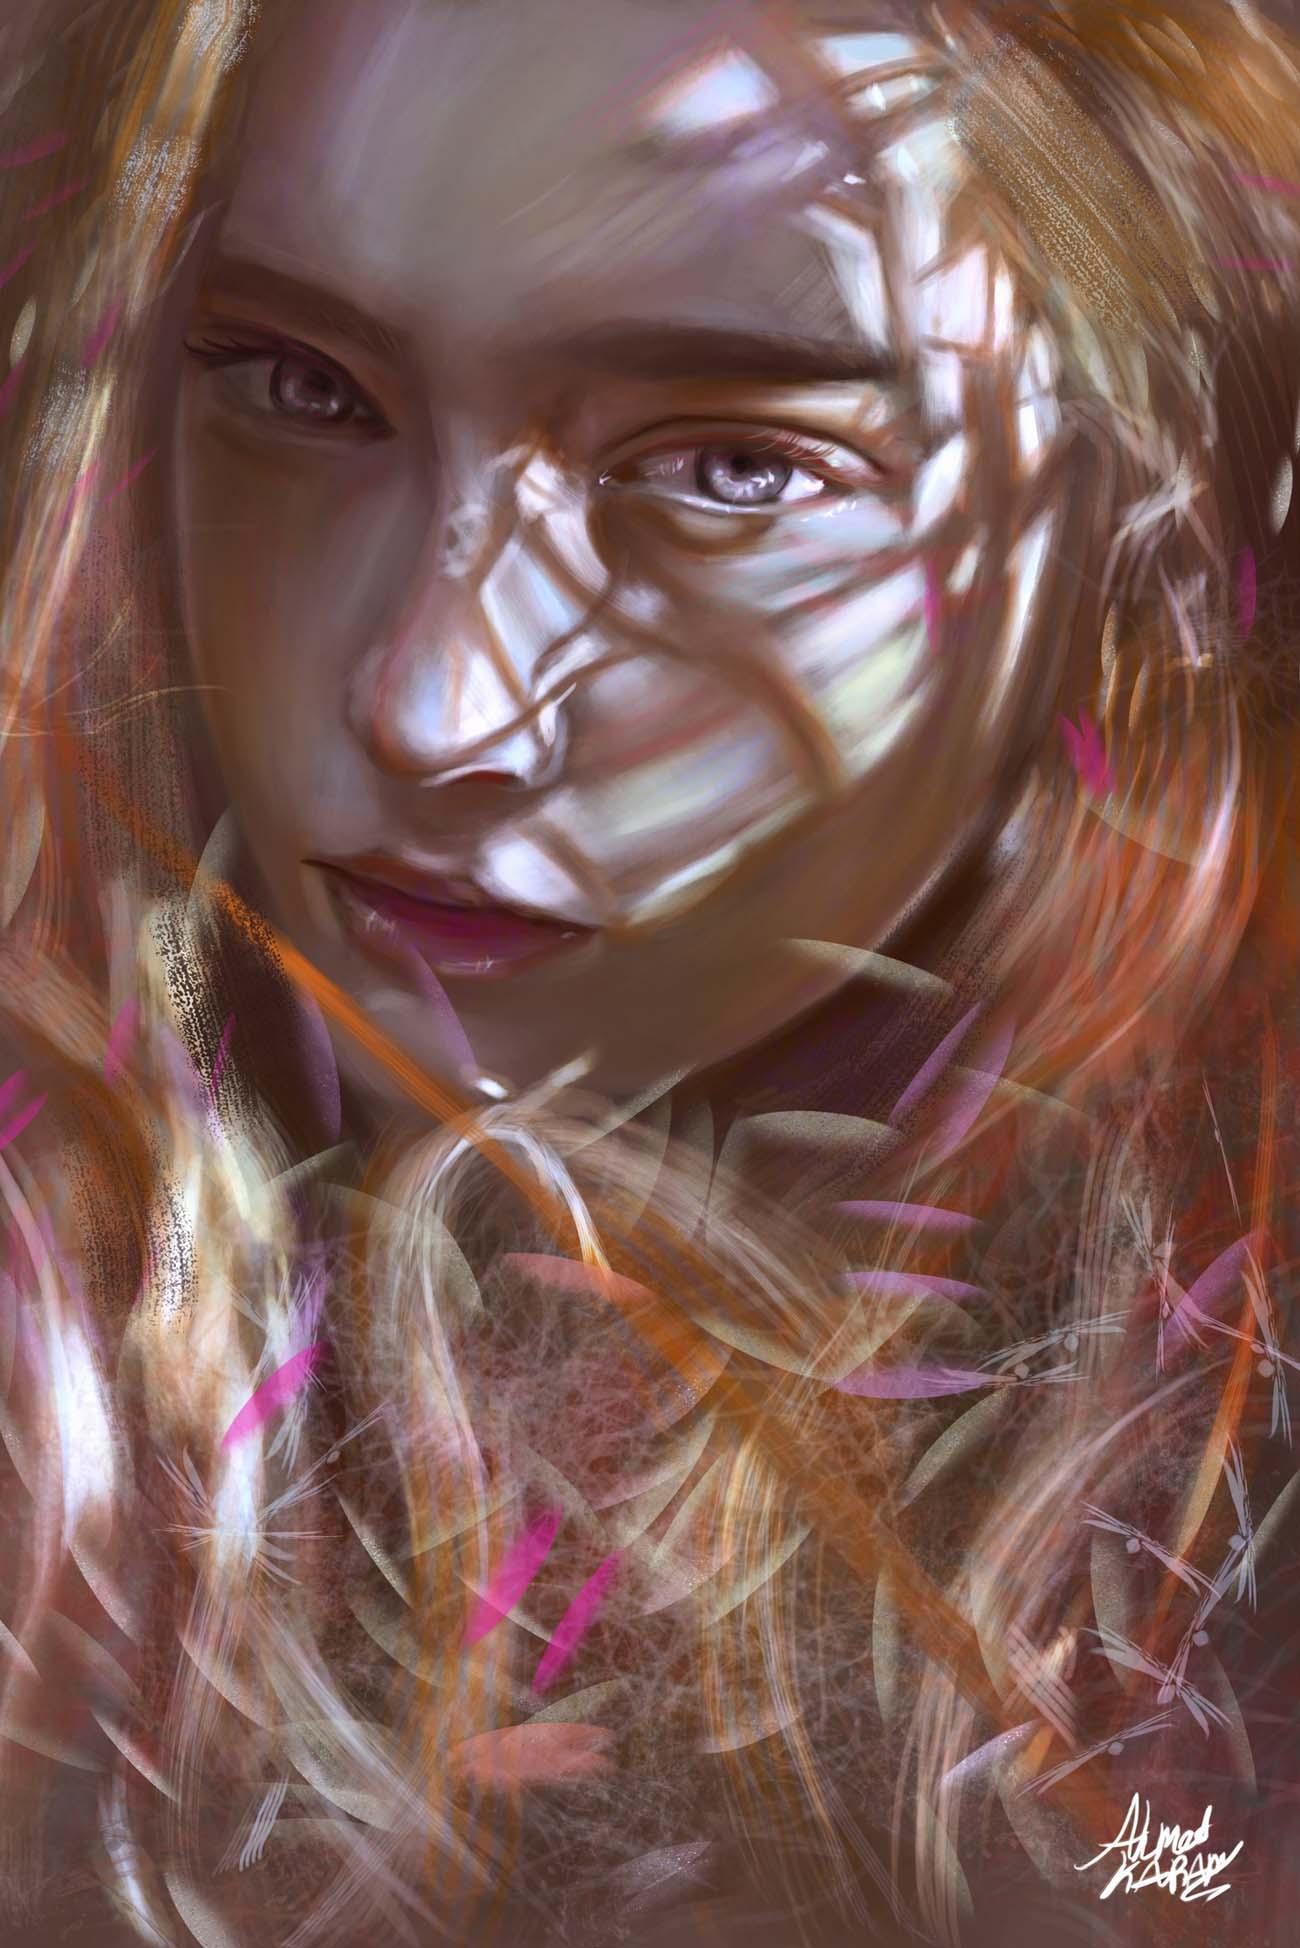 Ahmed Karam   Paintable.cc Digital Painting Inspiration - Learn the Art of Digital Painting! #digitalpainting #digitalart